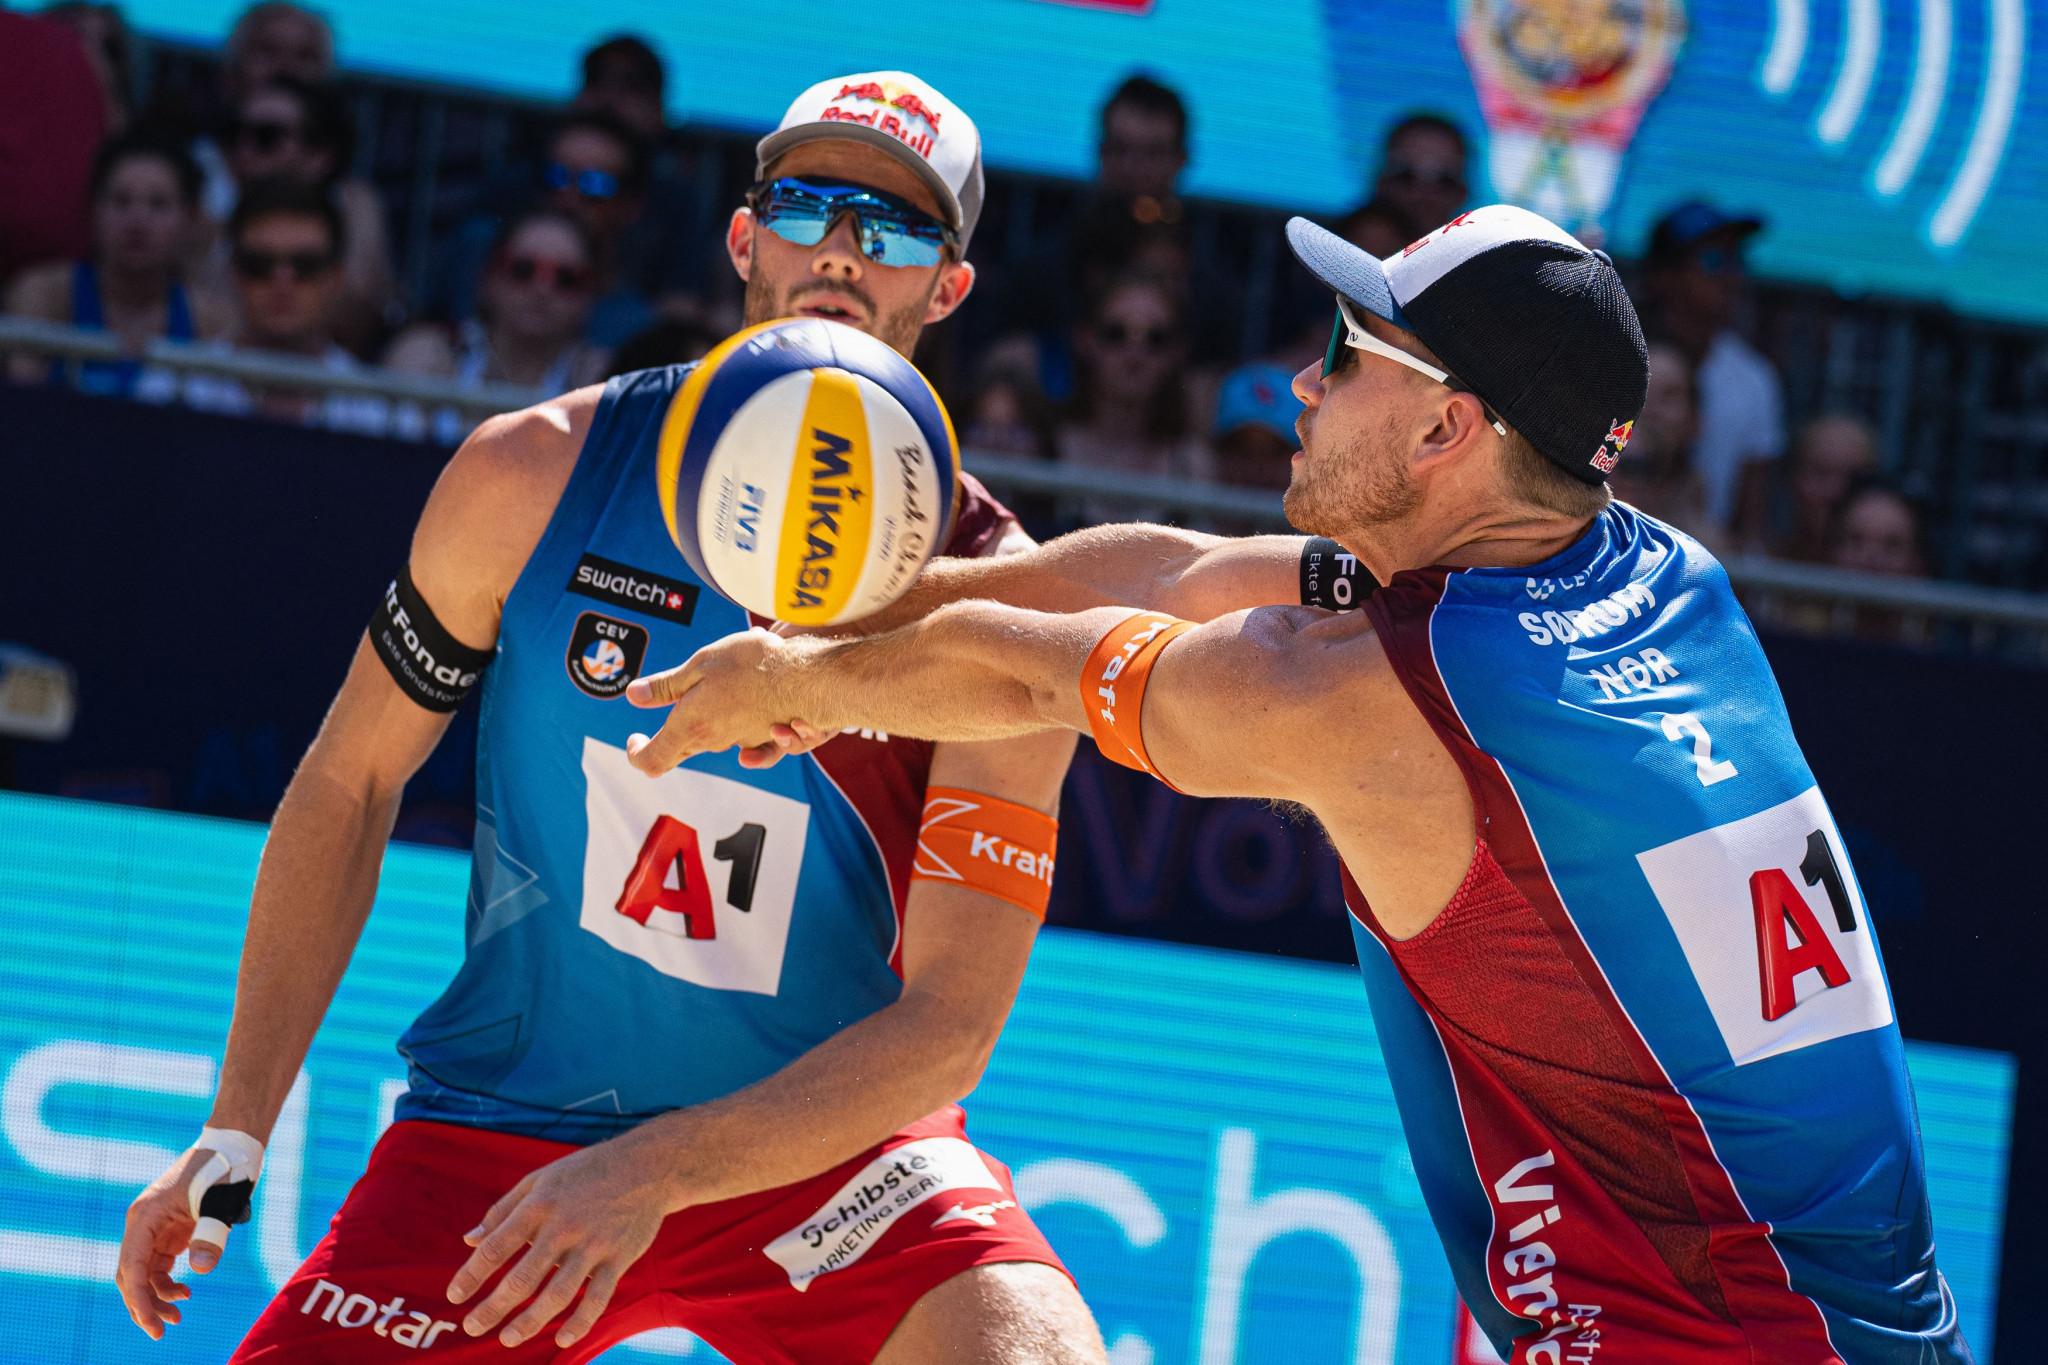 Mol and Sørum win fourth successive men's EuroBeachVolley title